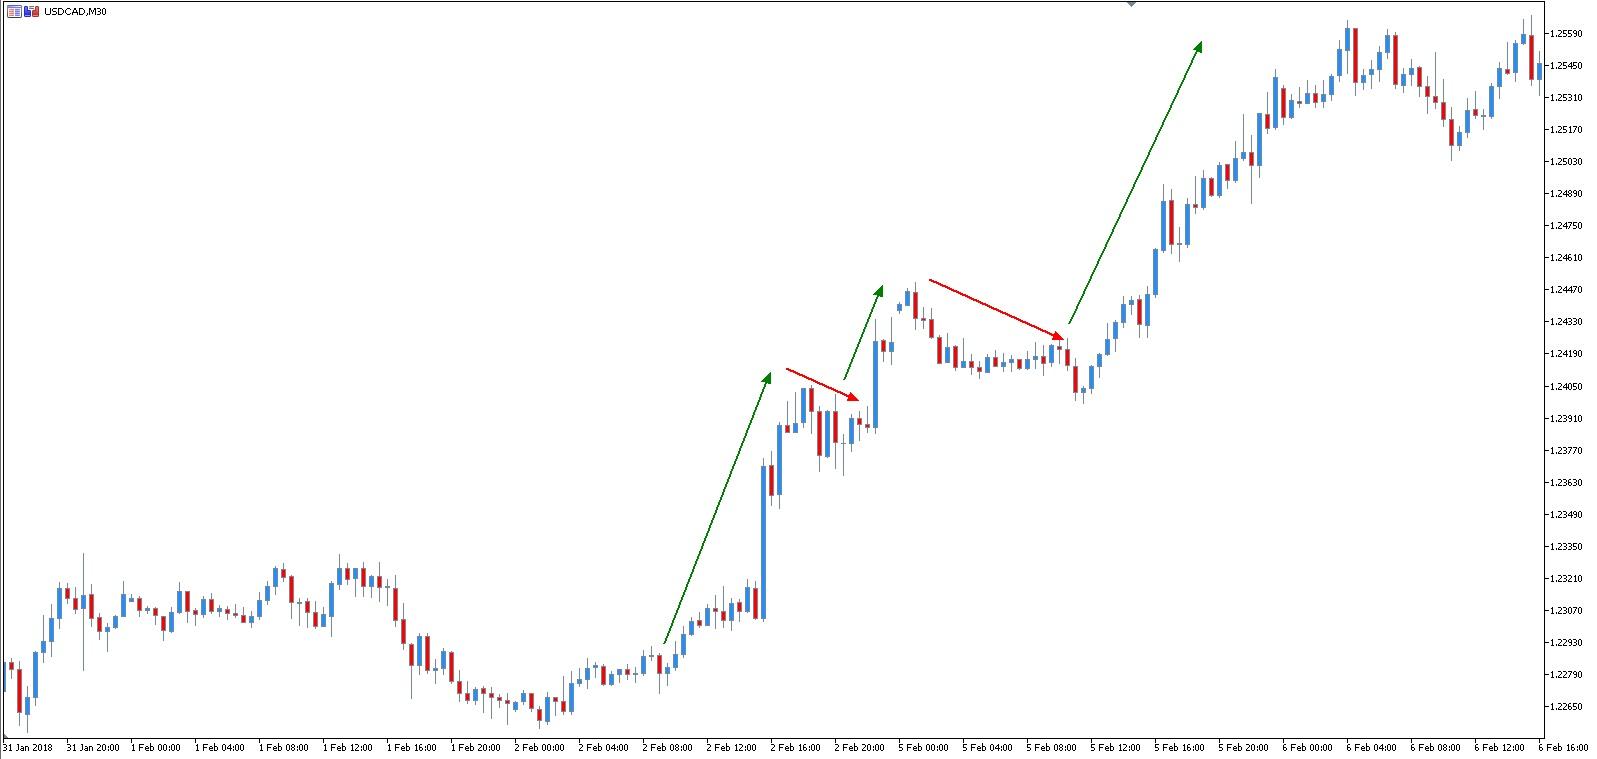 pronostico forex - USD CAD